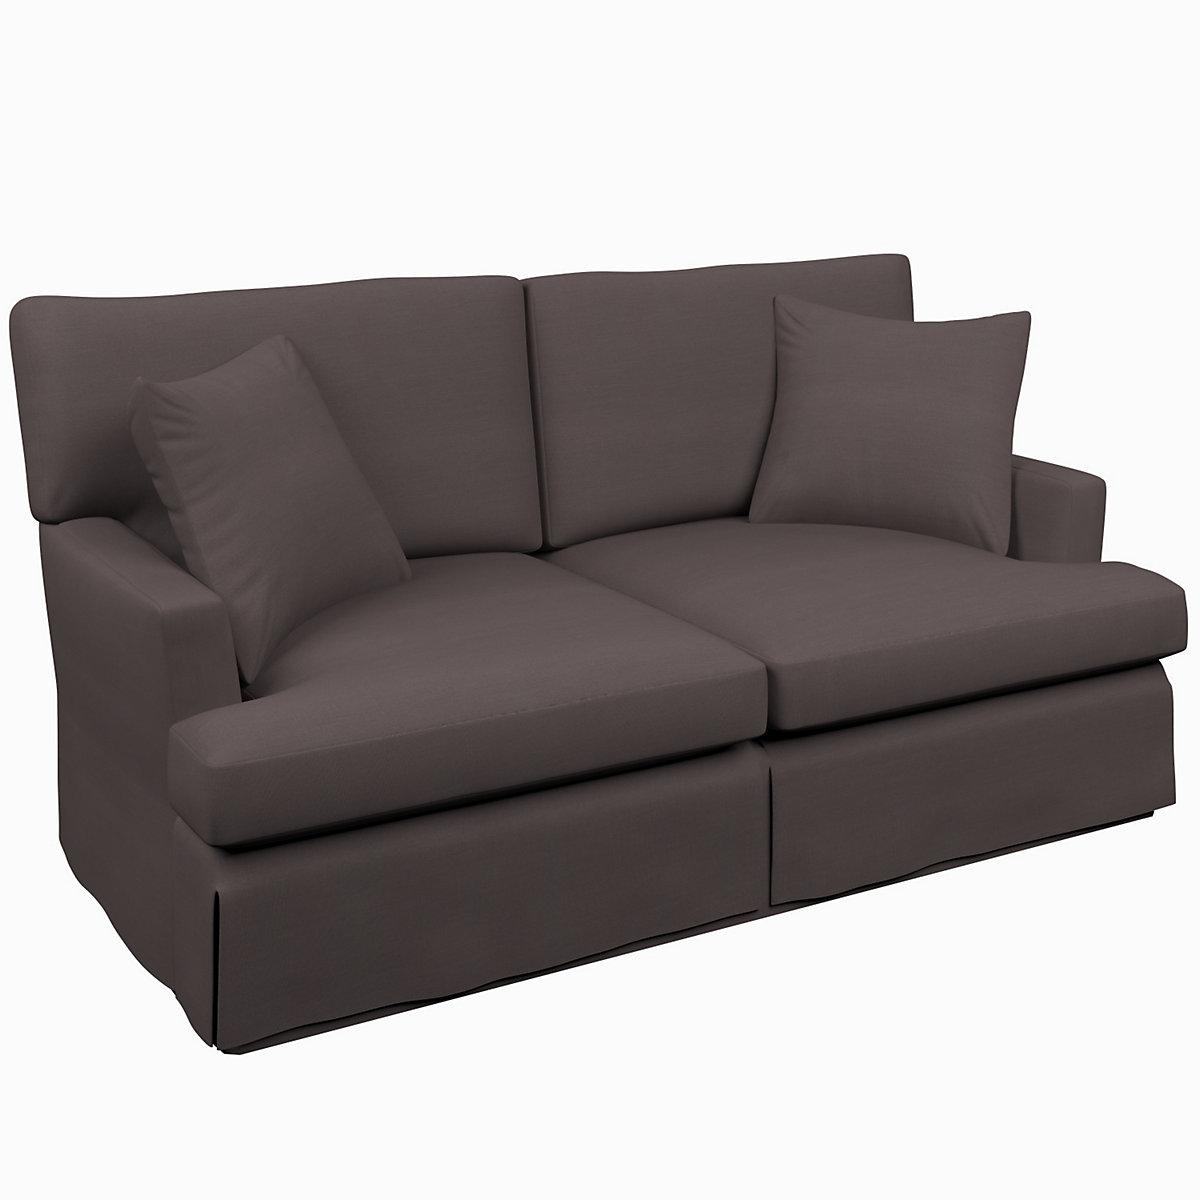 Estate linen shale saybrook 2 seater upholstered sofa for Shale sofa bed